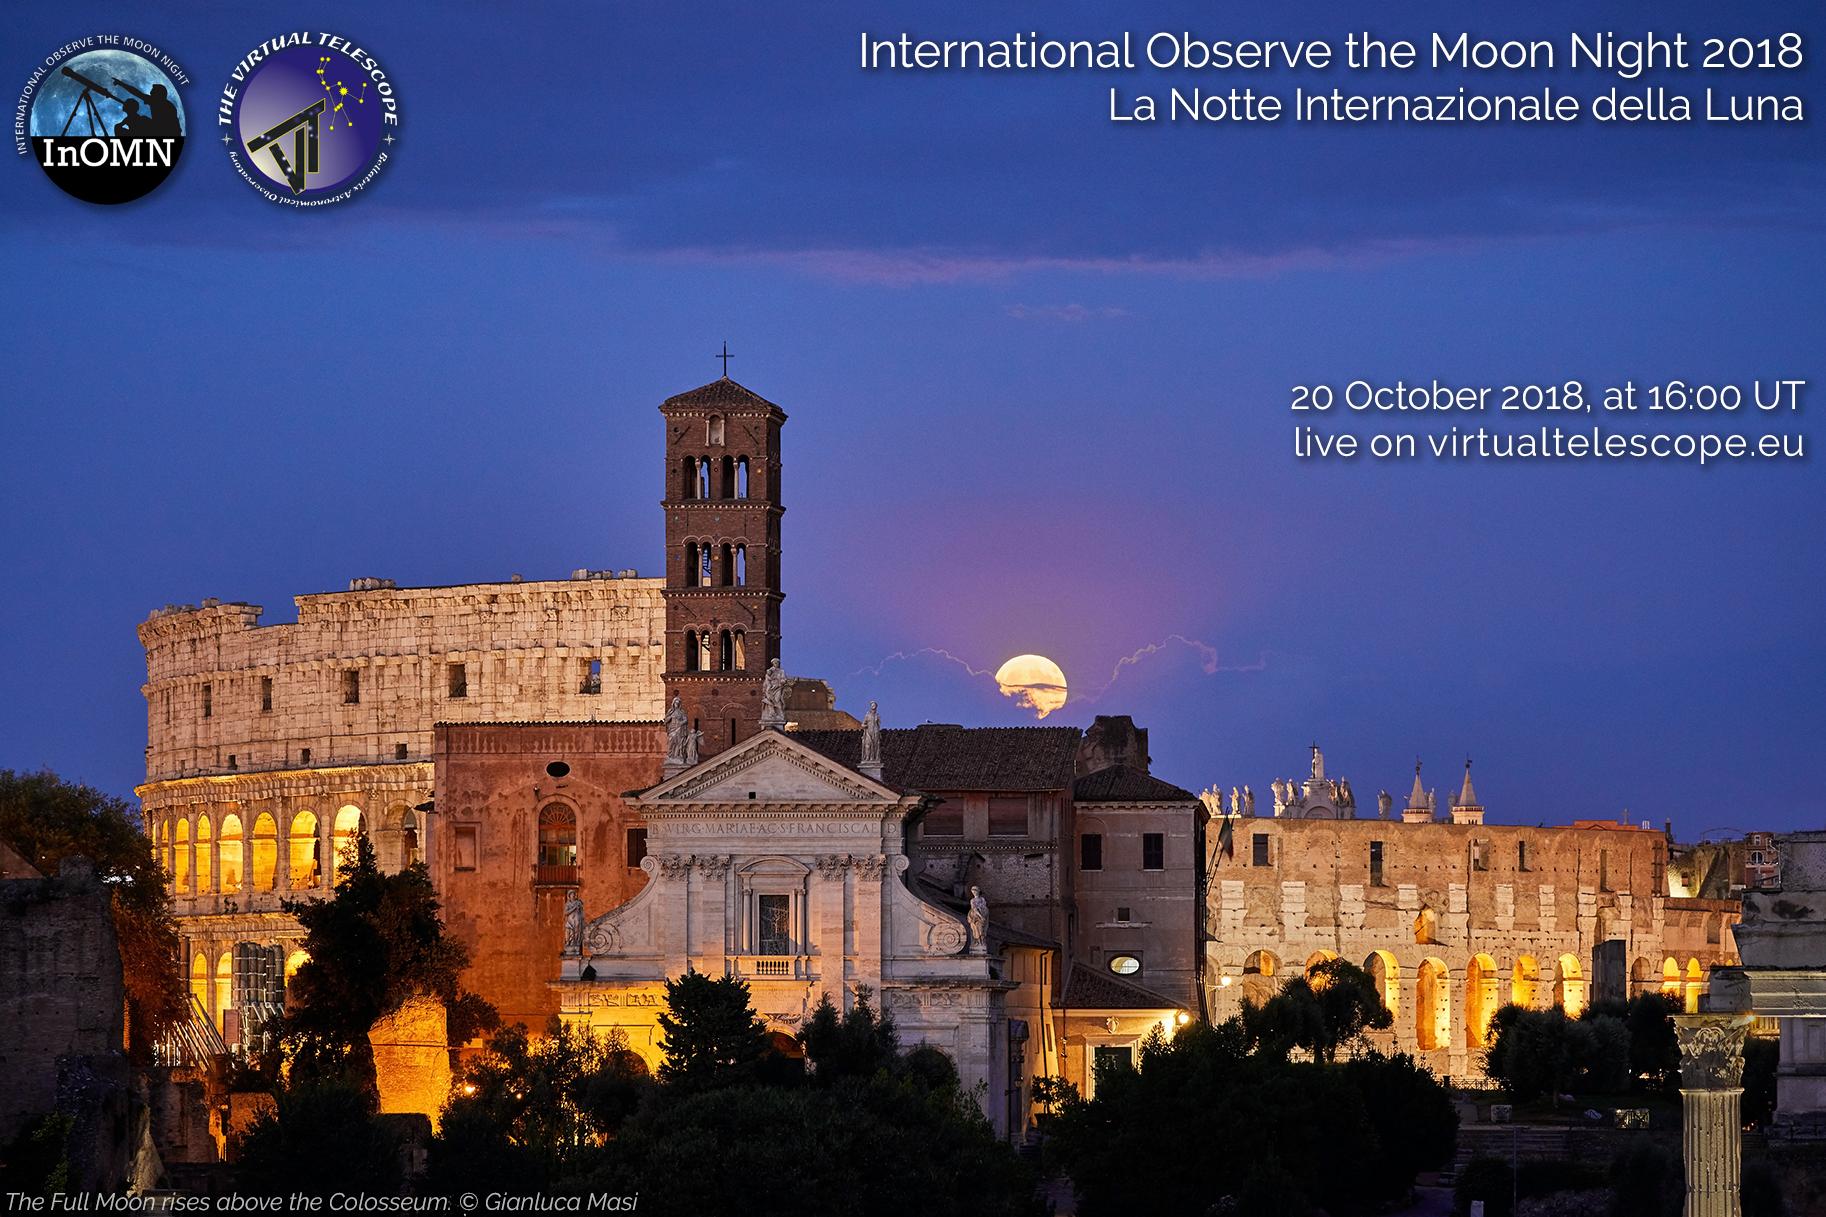 International Observe the Moon Night 2018: online observation - 20 Oct. 2018